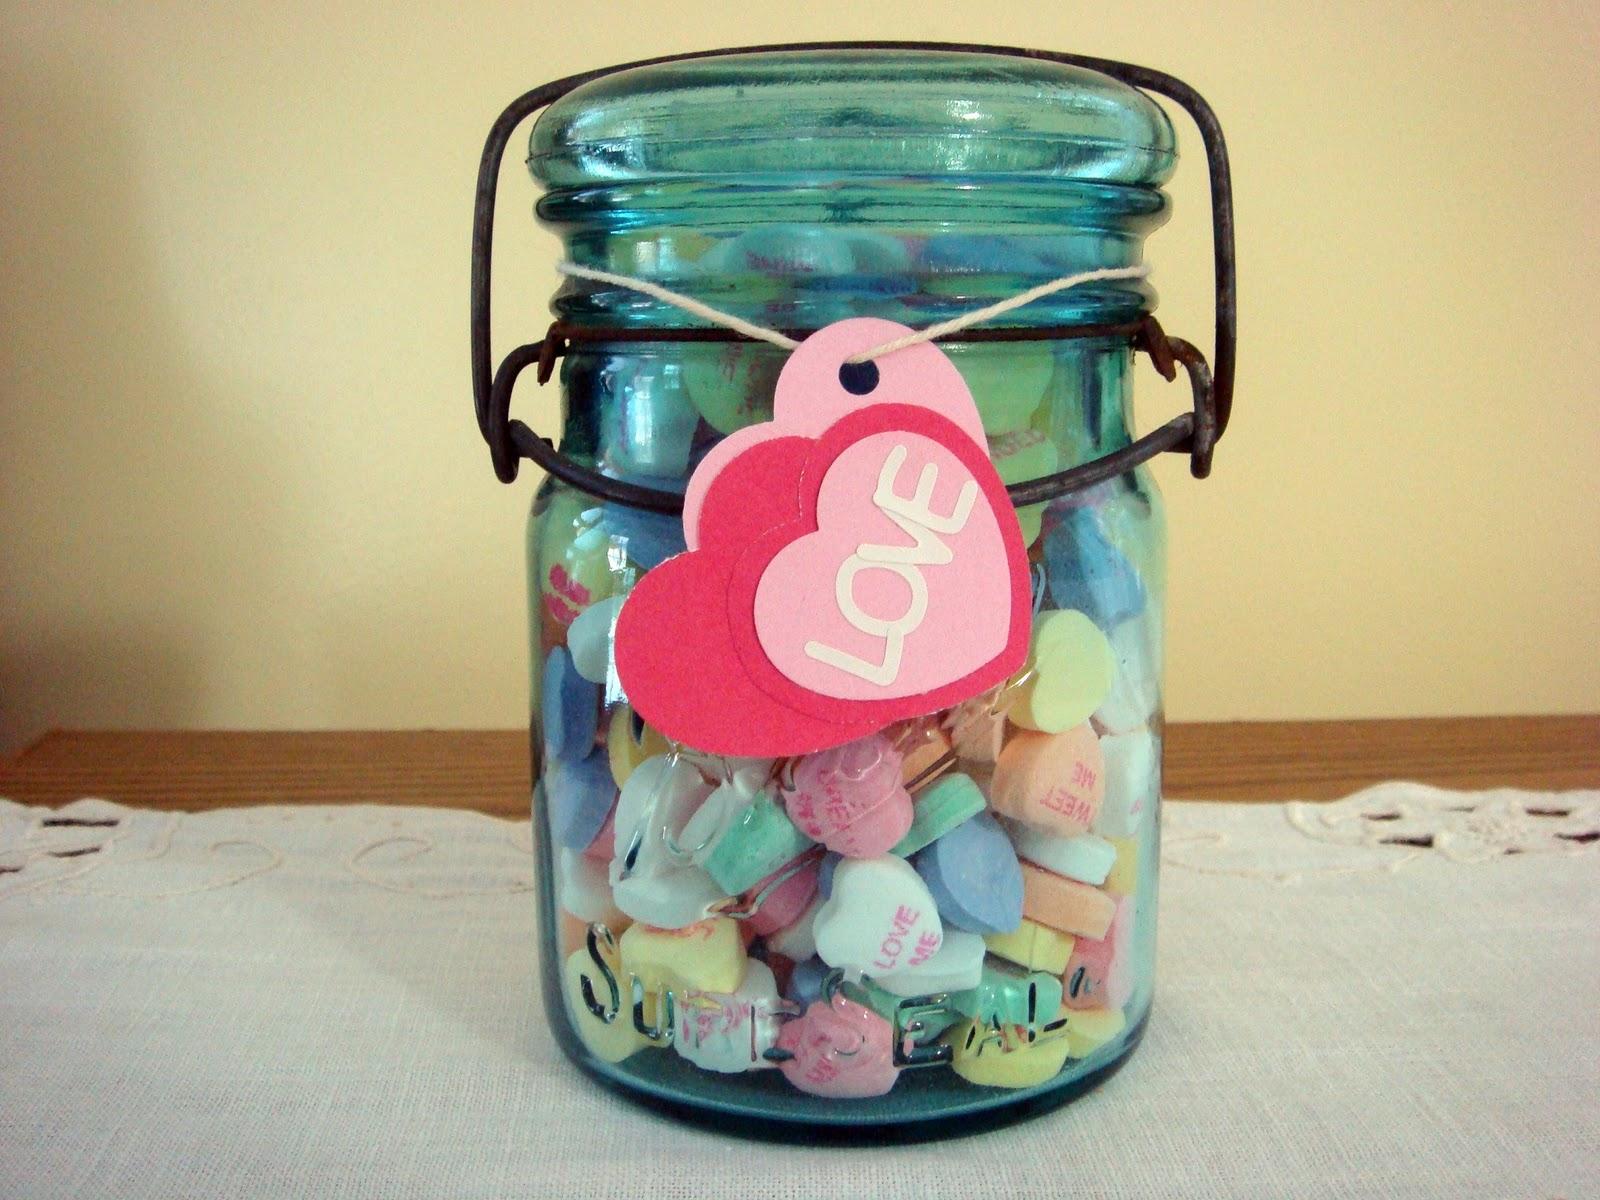 http://4.bp.blogspot.com/-Lc4cjF64I20/TcuV70v2kEI/AAAAAAAAAOw/8zeu5IEsgJU/s1600/Candy+Hearts+Jar.jpg